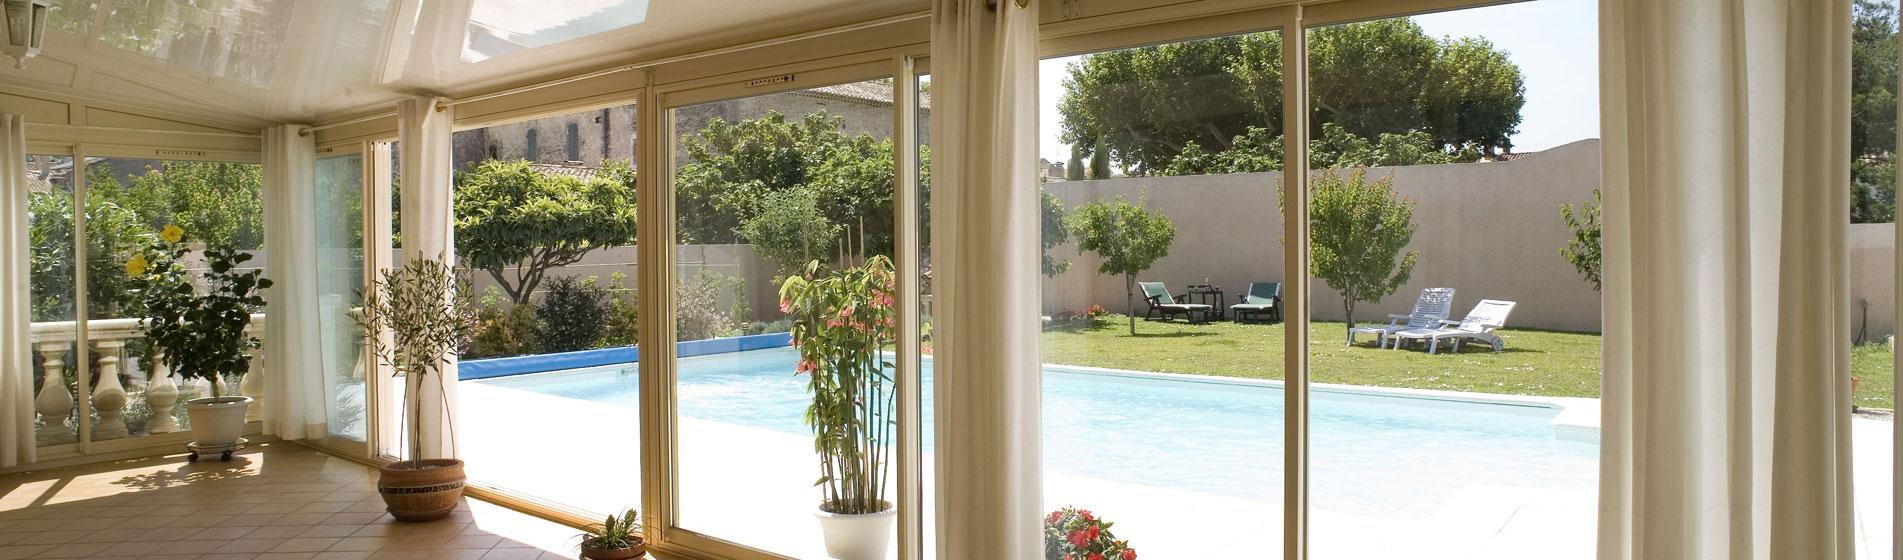 acheter extension maison sur-mesure 30 Gard